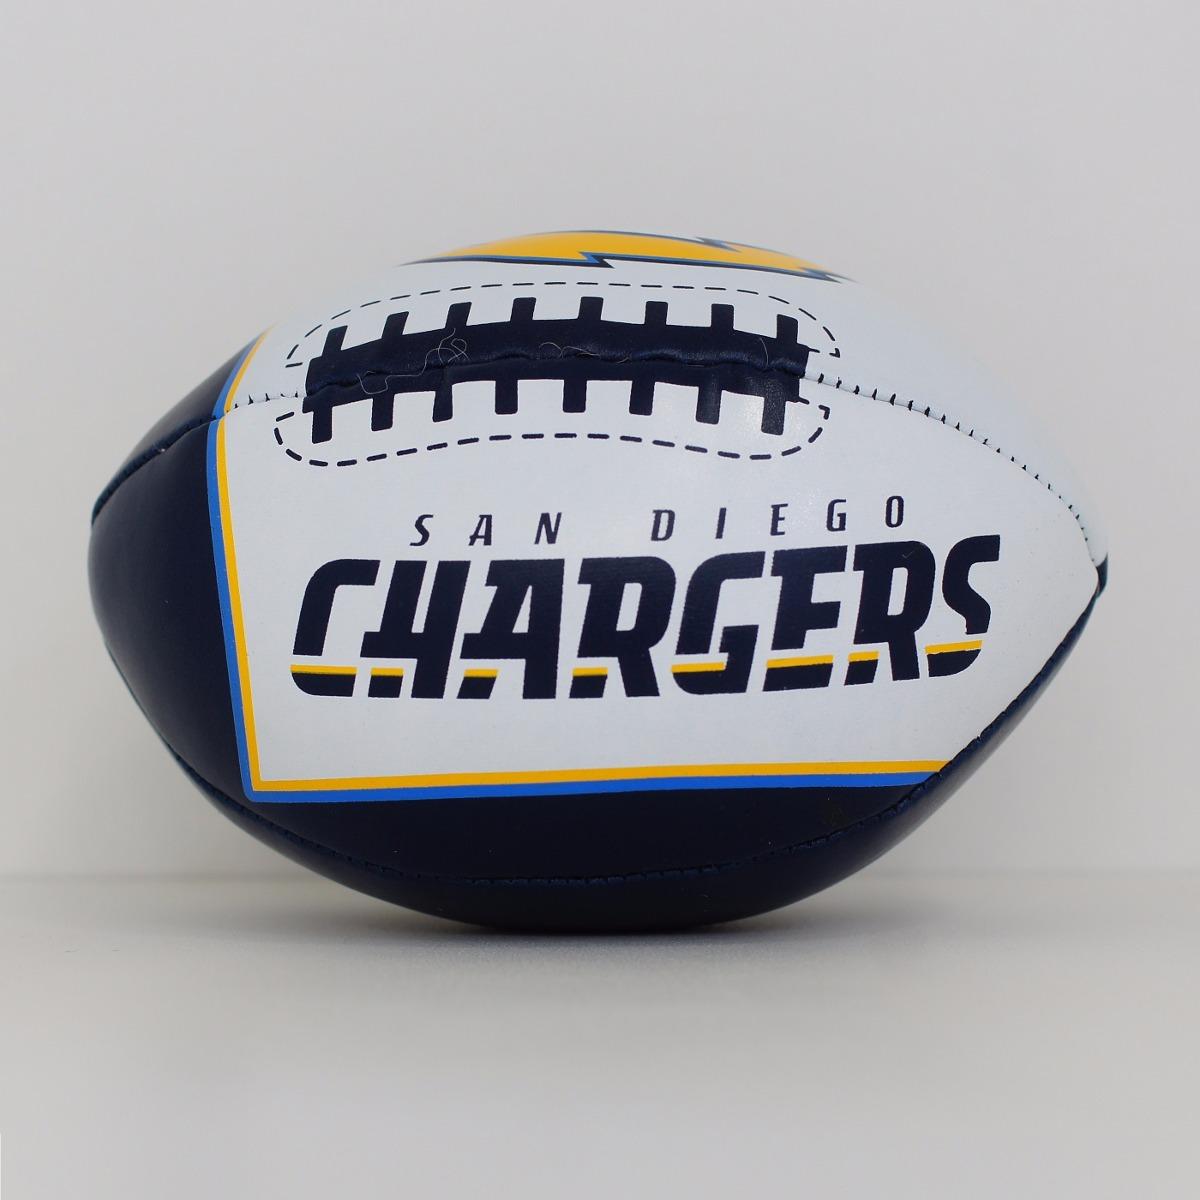 db19f64d4 Mini Bola Futebol Americano - Nfl - San Diego Chargers - R  49